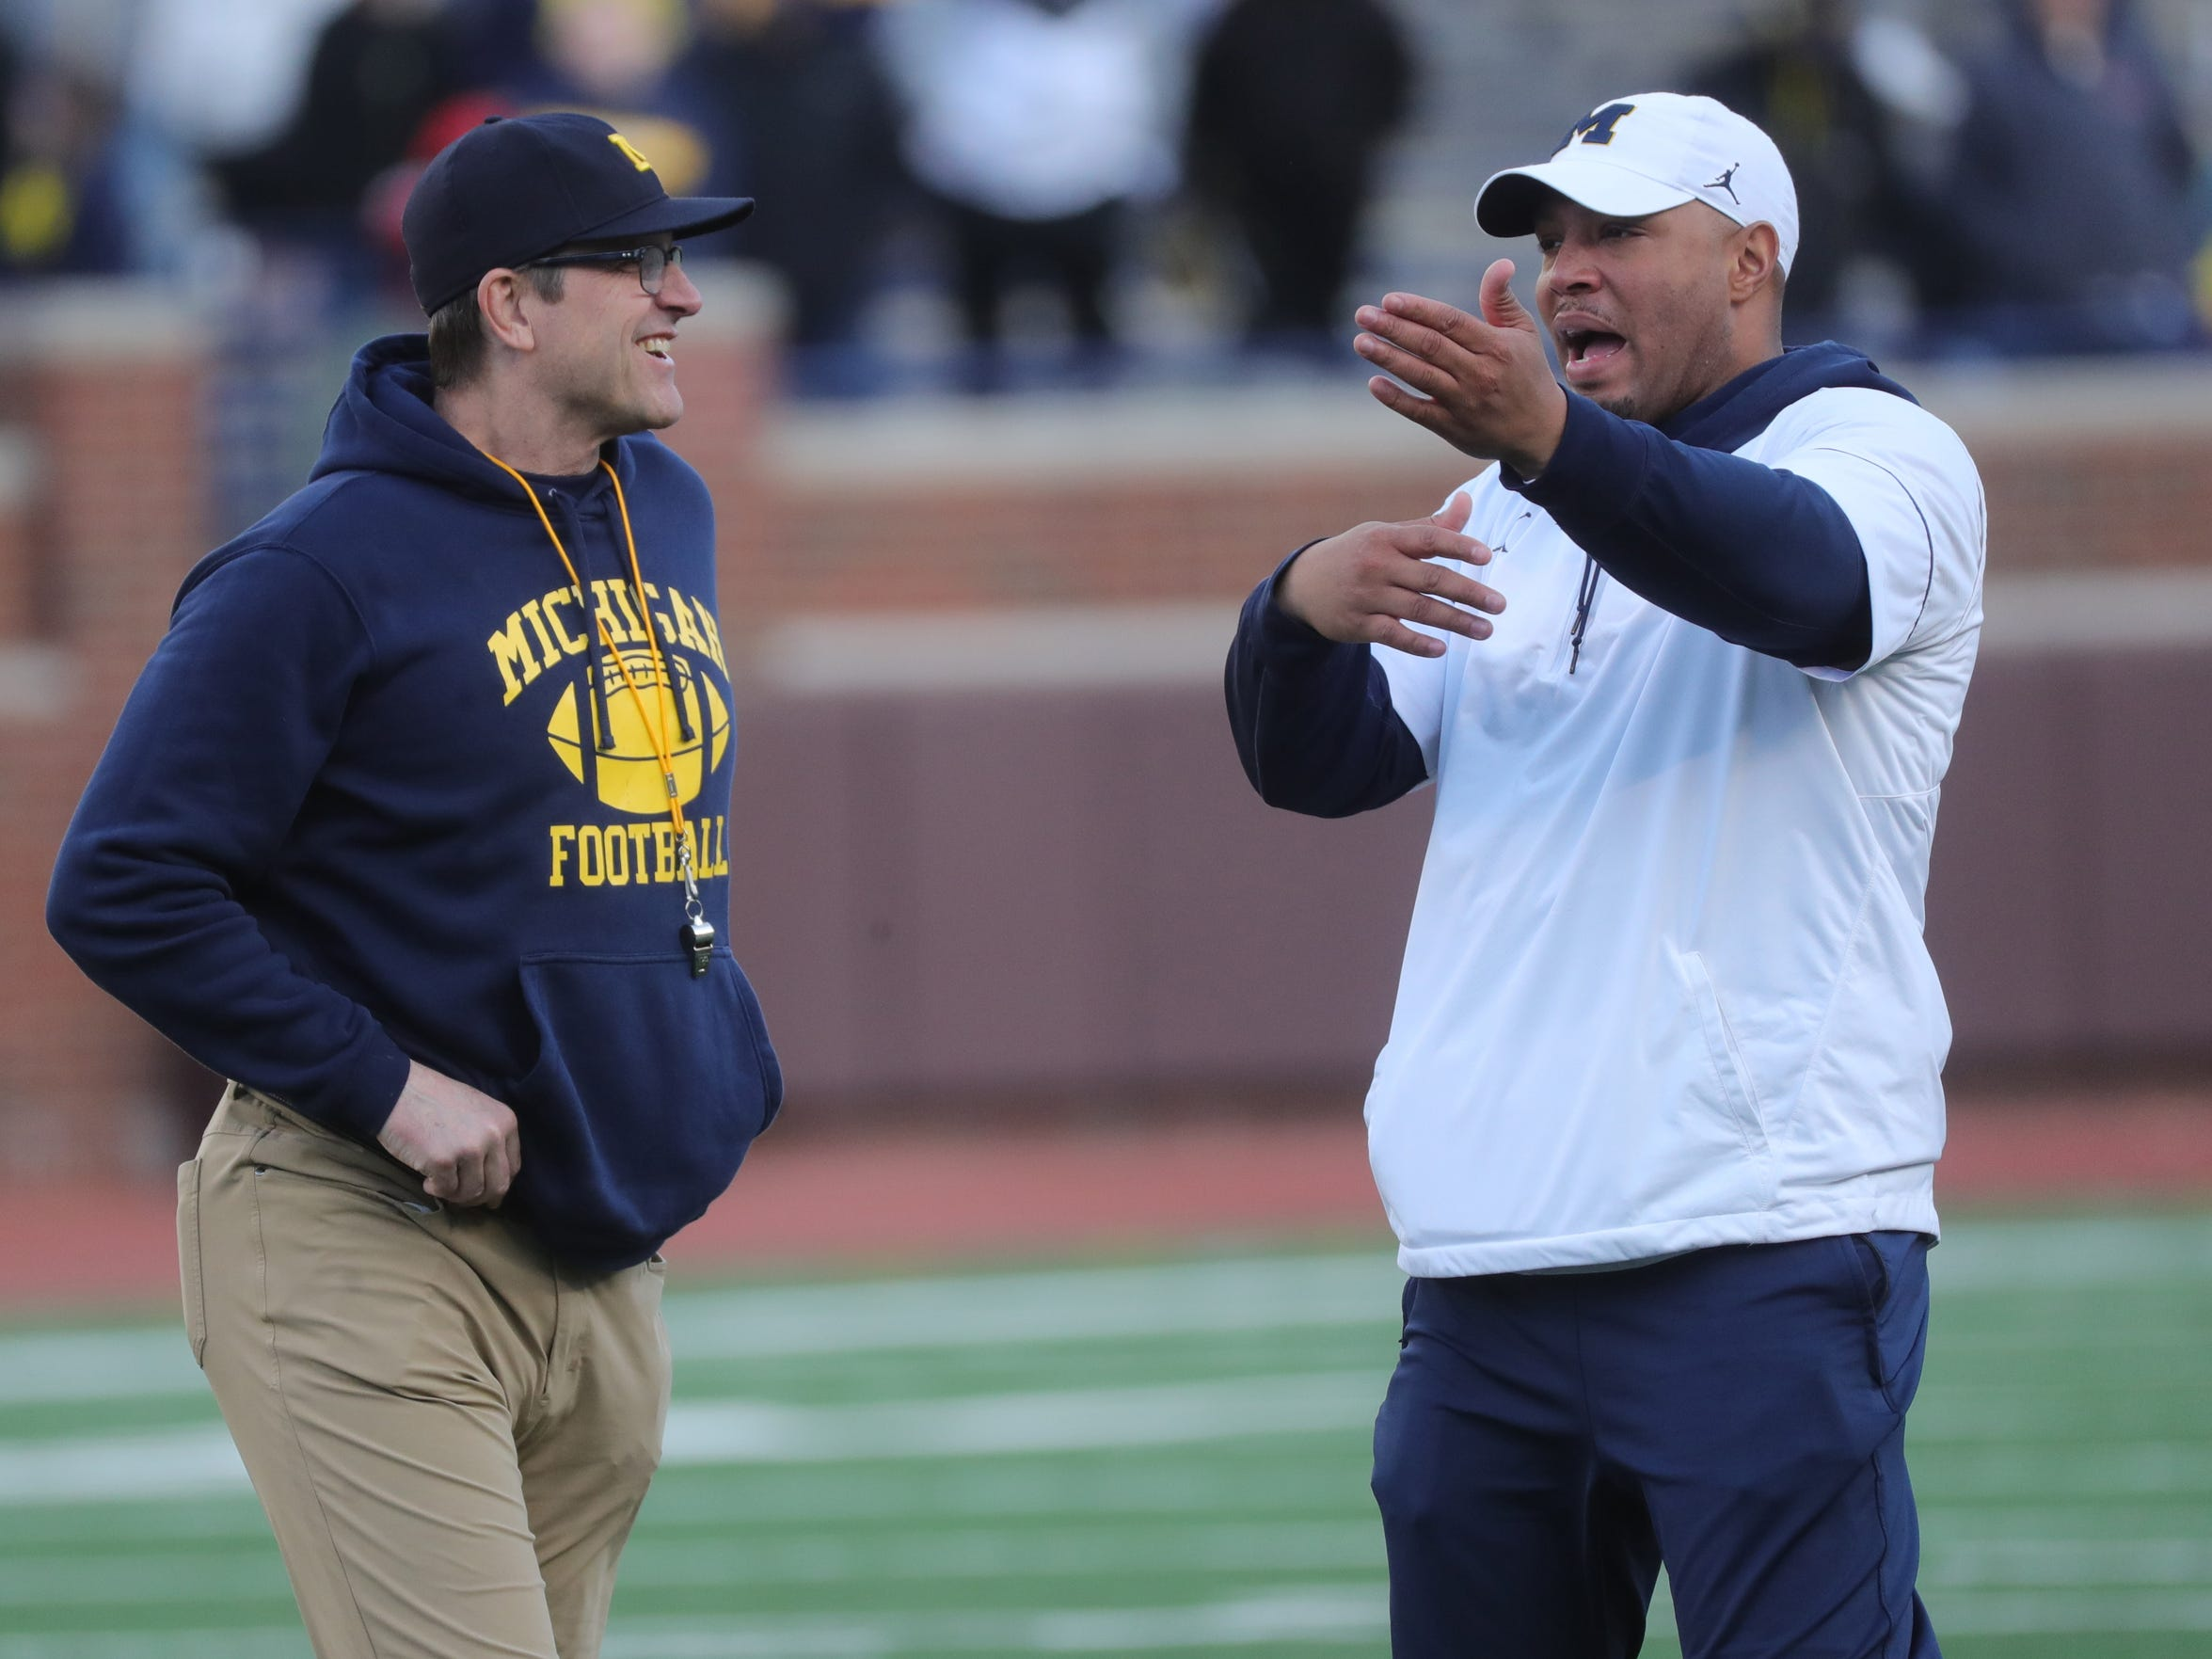 Michigan head coach Jim Harbaugh and offensive coordinator Josh Gattis during the spring game Saturday, April 13, 2019 at Michigan Stadium in Ann Arbor.